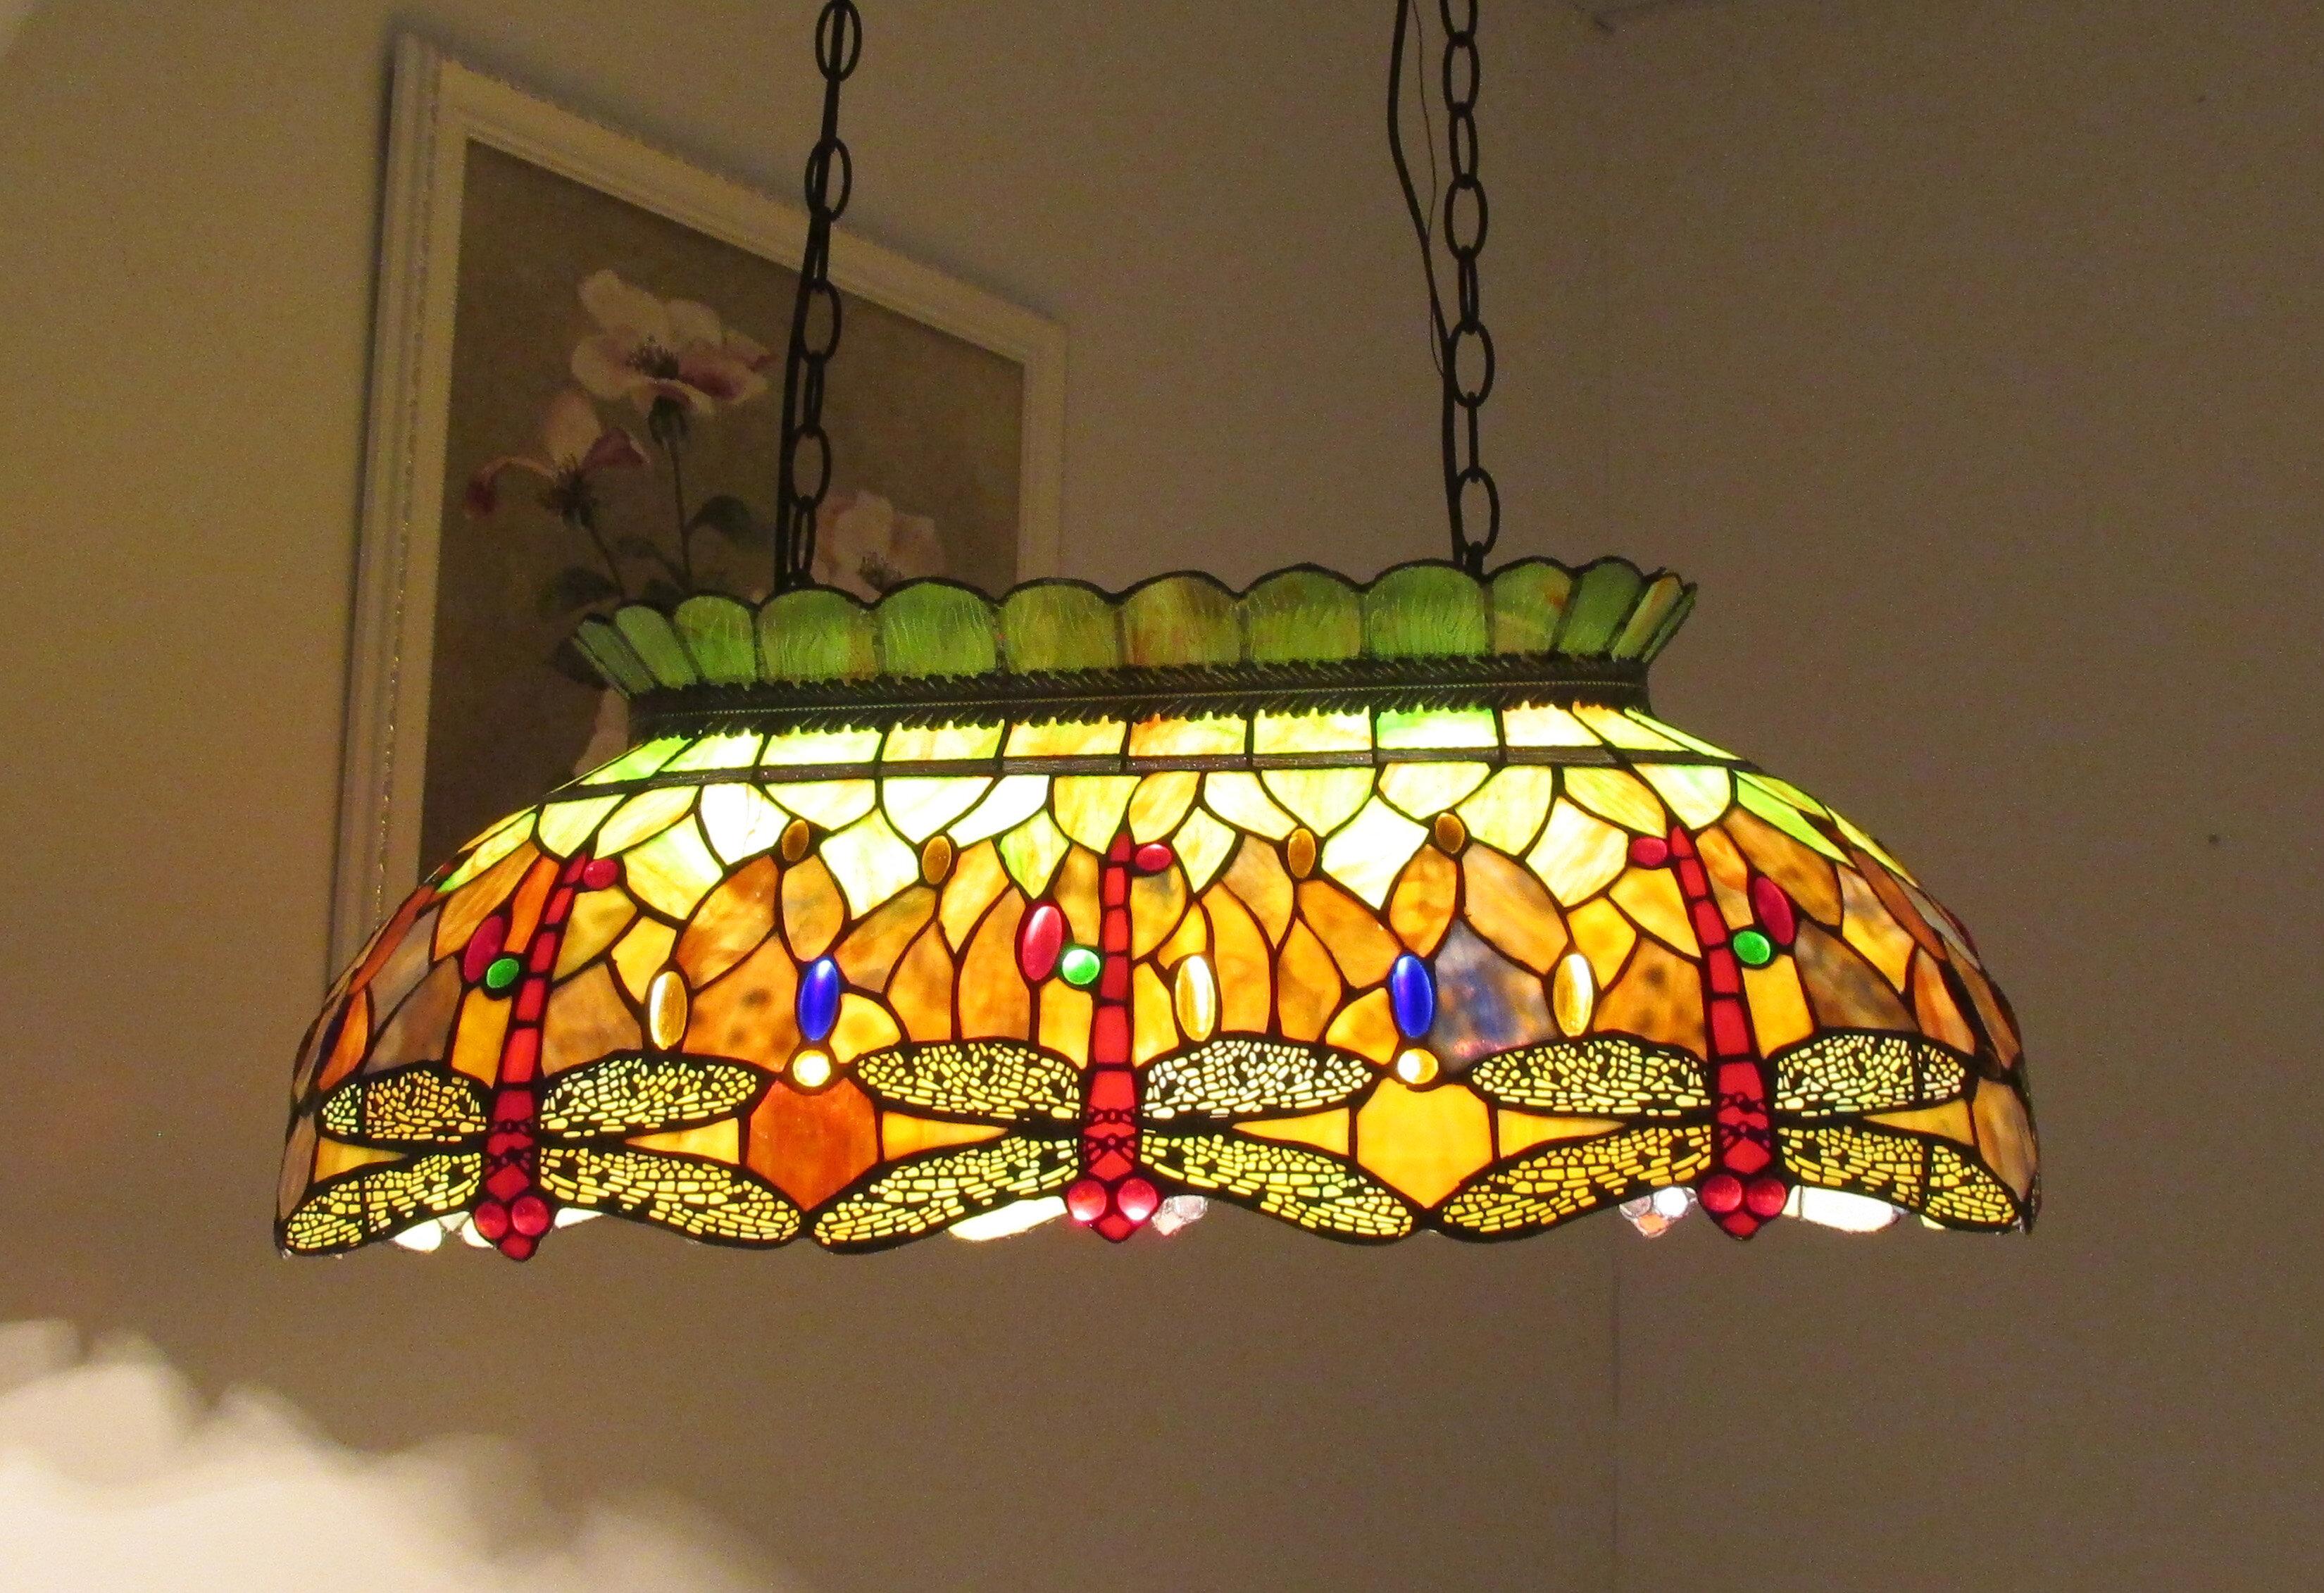 Astoria Grand Thames Dragonfly 3 Light Pool Table Light U0026 Reviews | Wayfair